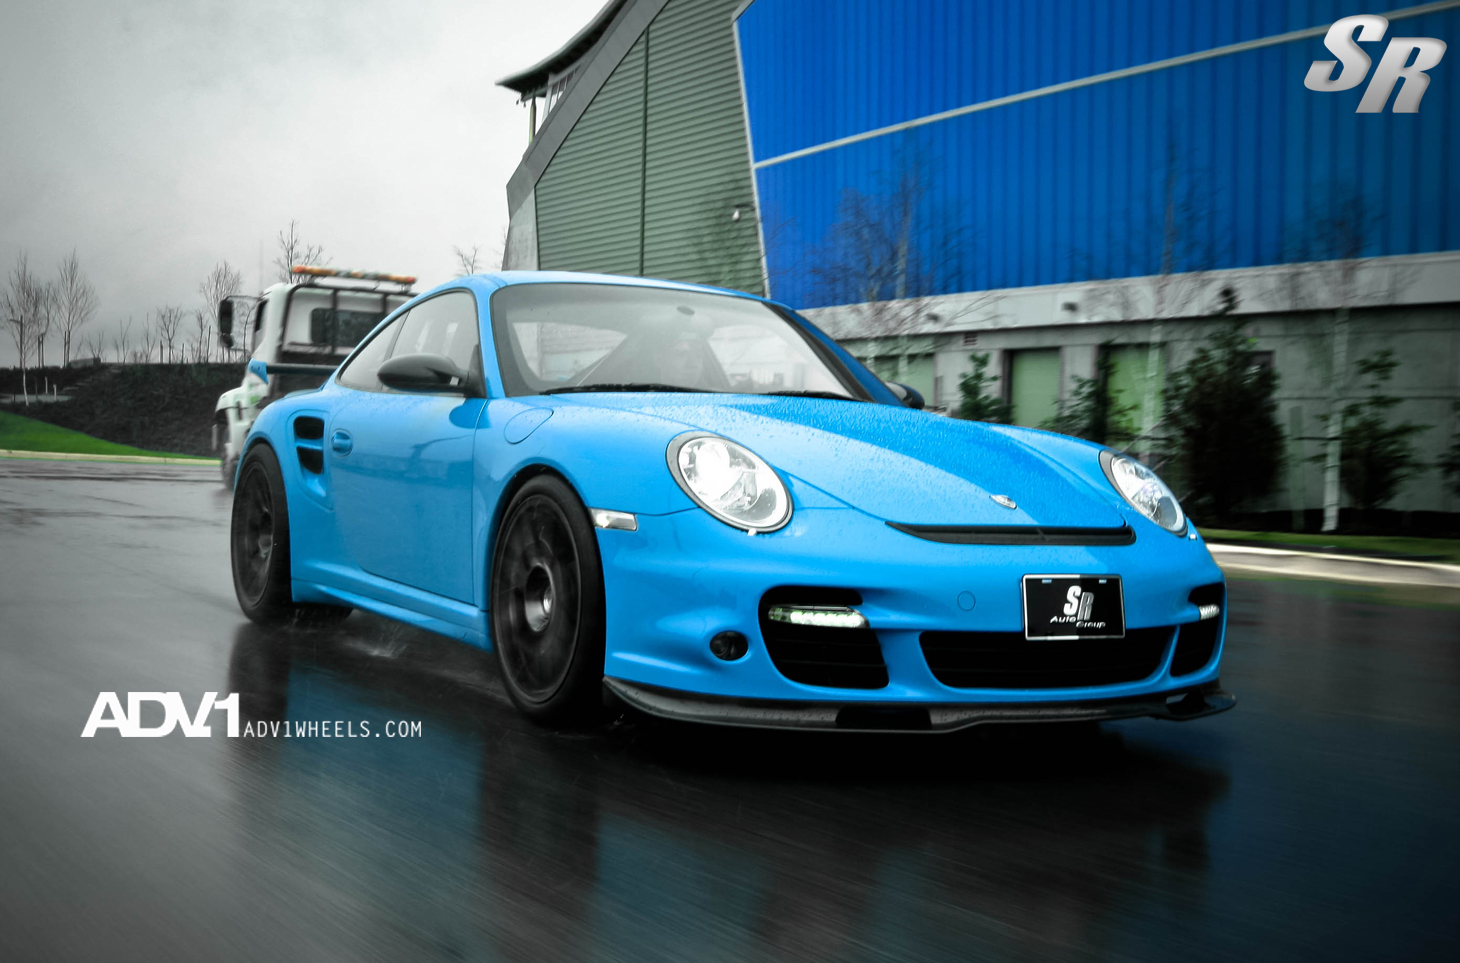 Tags: 997, ADV1 rims, Porsche,